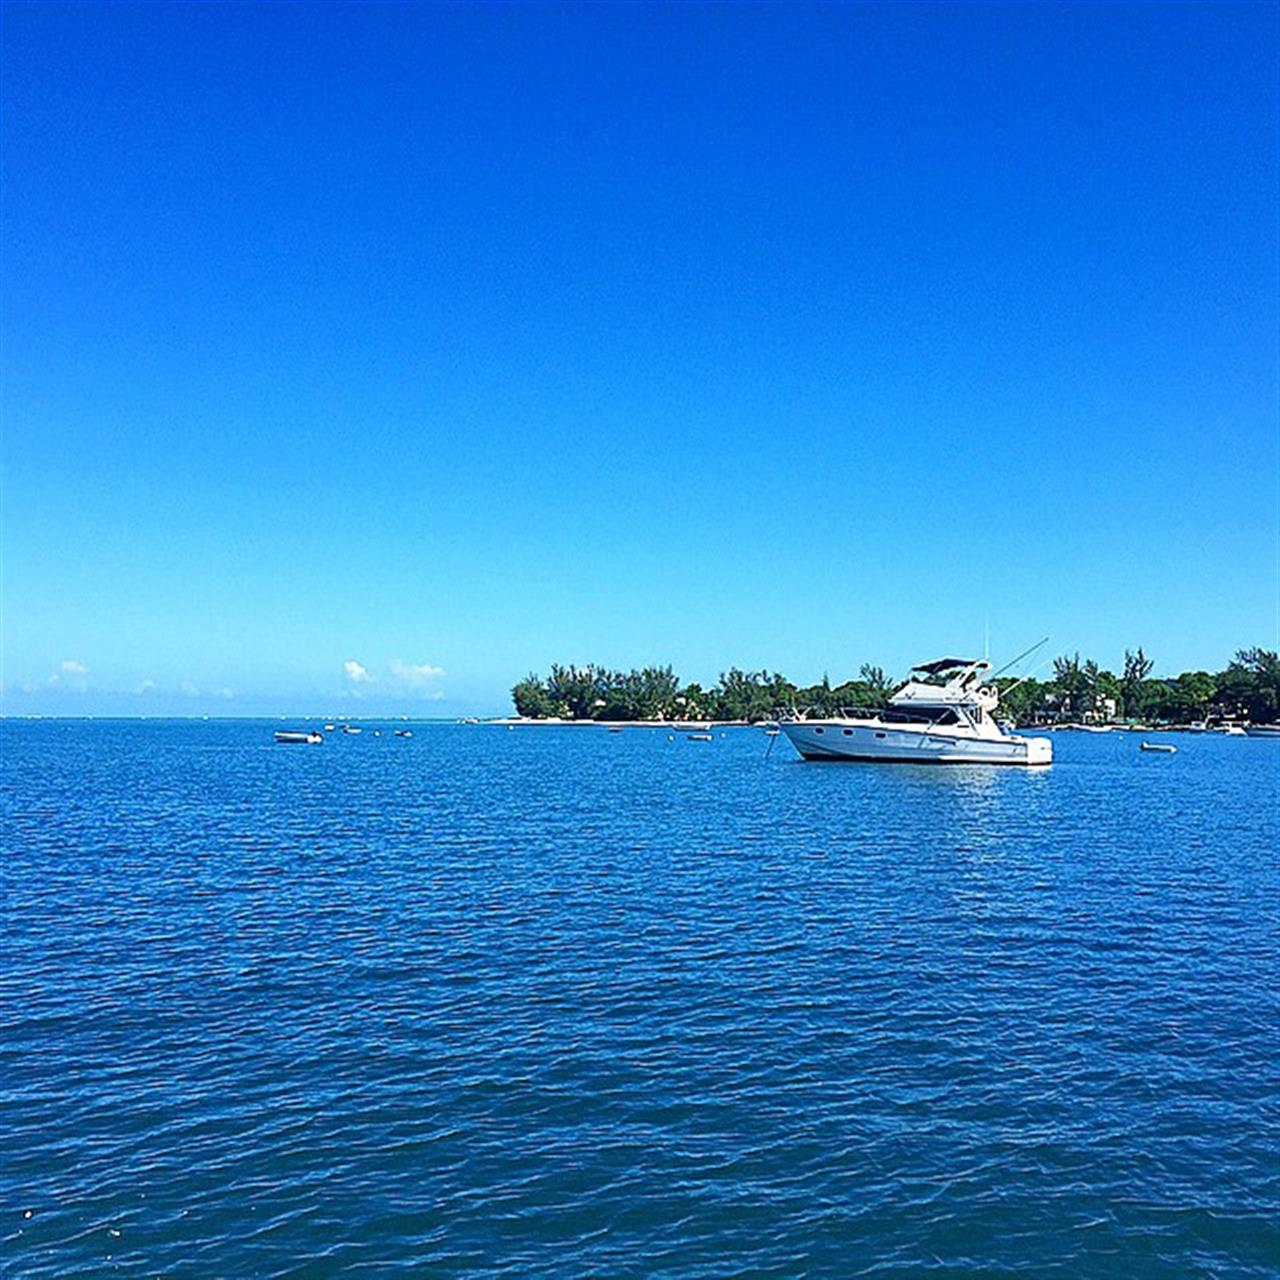 #biggamefishing #mauritius #fishing #LeadingRelocal